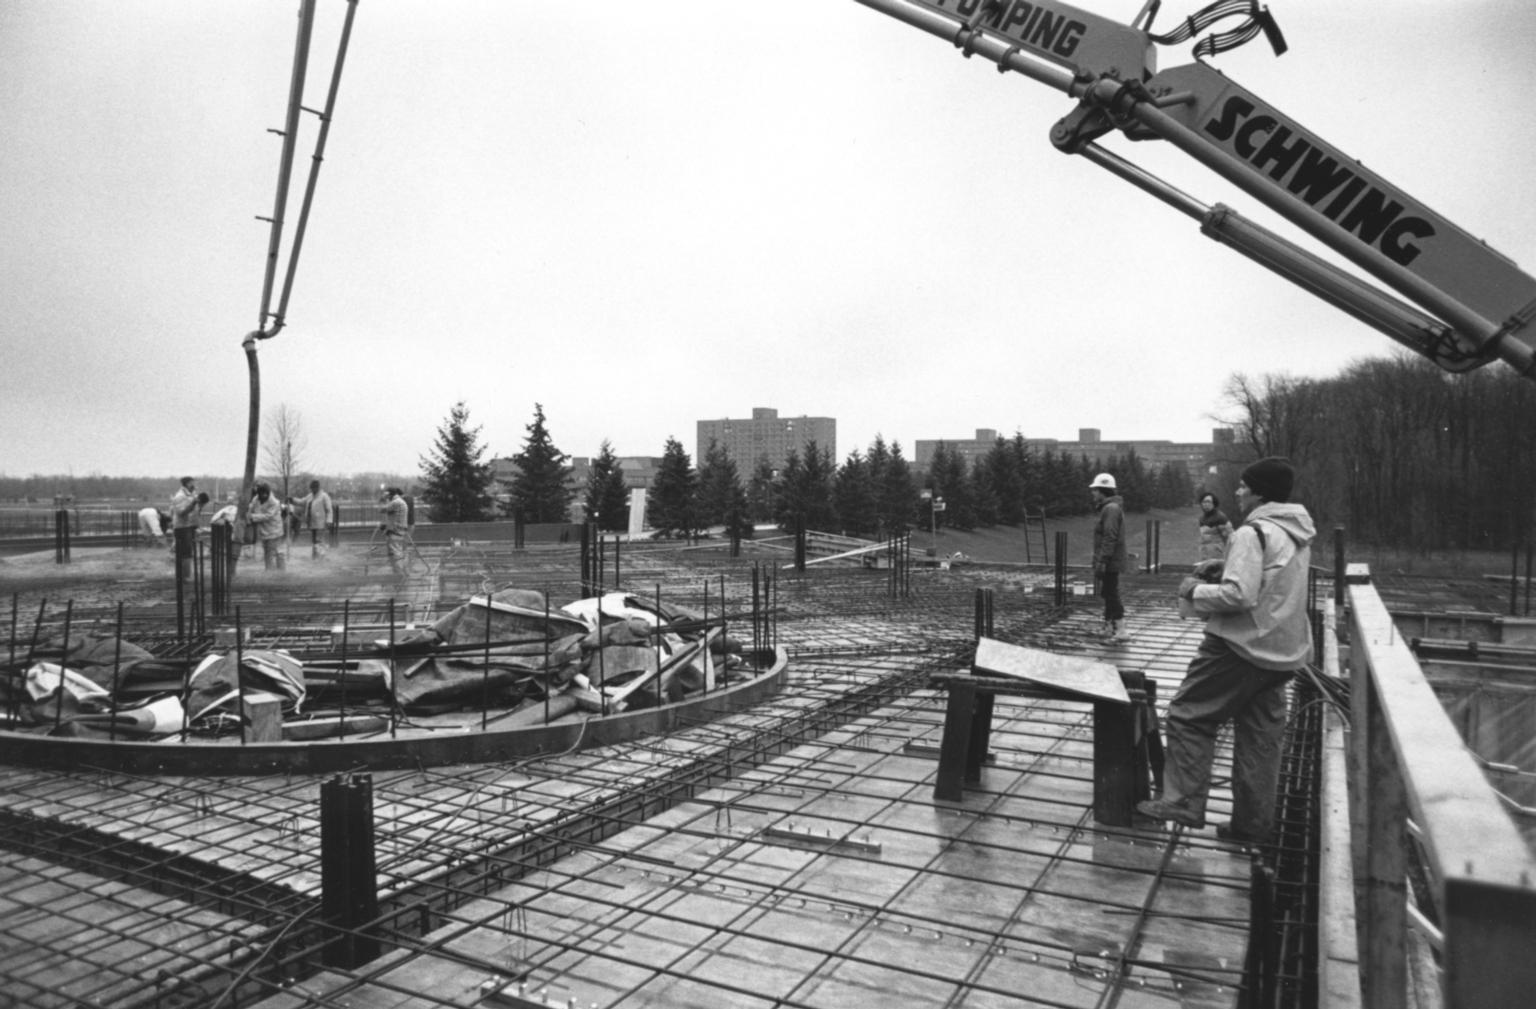 Kilian J. and Caroline F. Schmitt Interfaith Center Construction Site